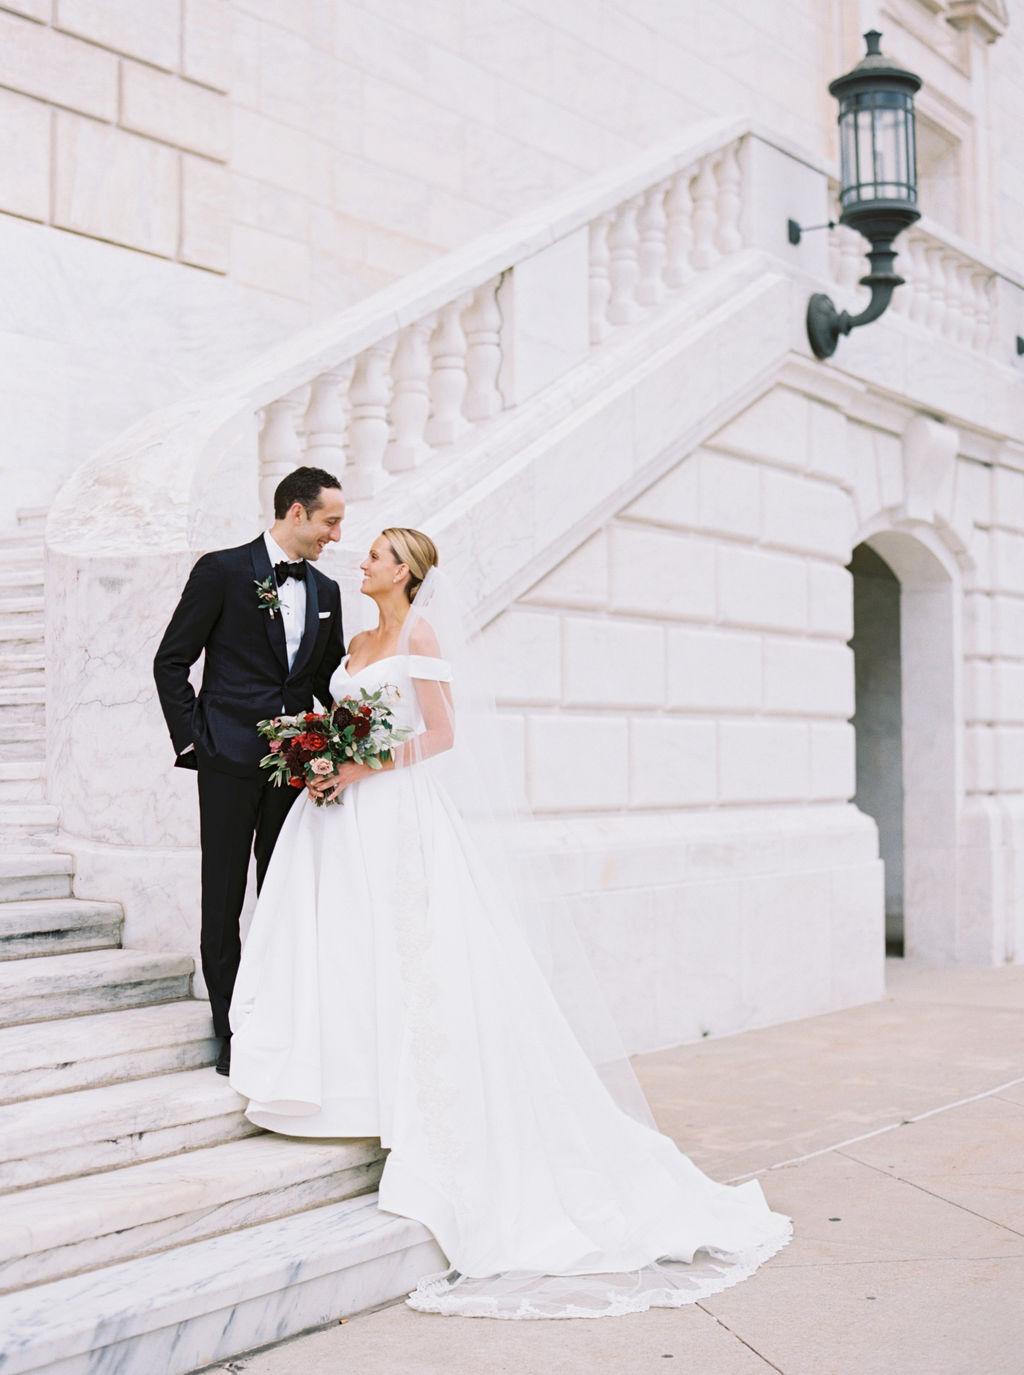 Kyle-Menna-Wedding-krmorenophoto-420.jpg